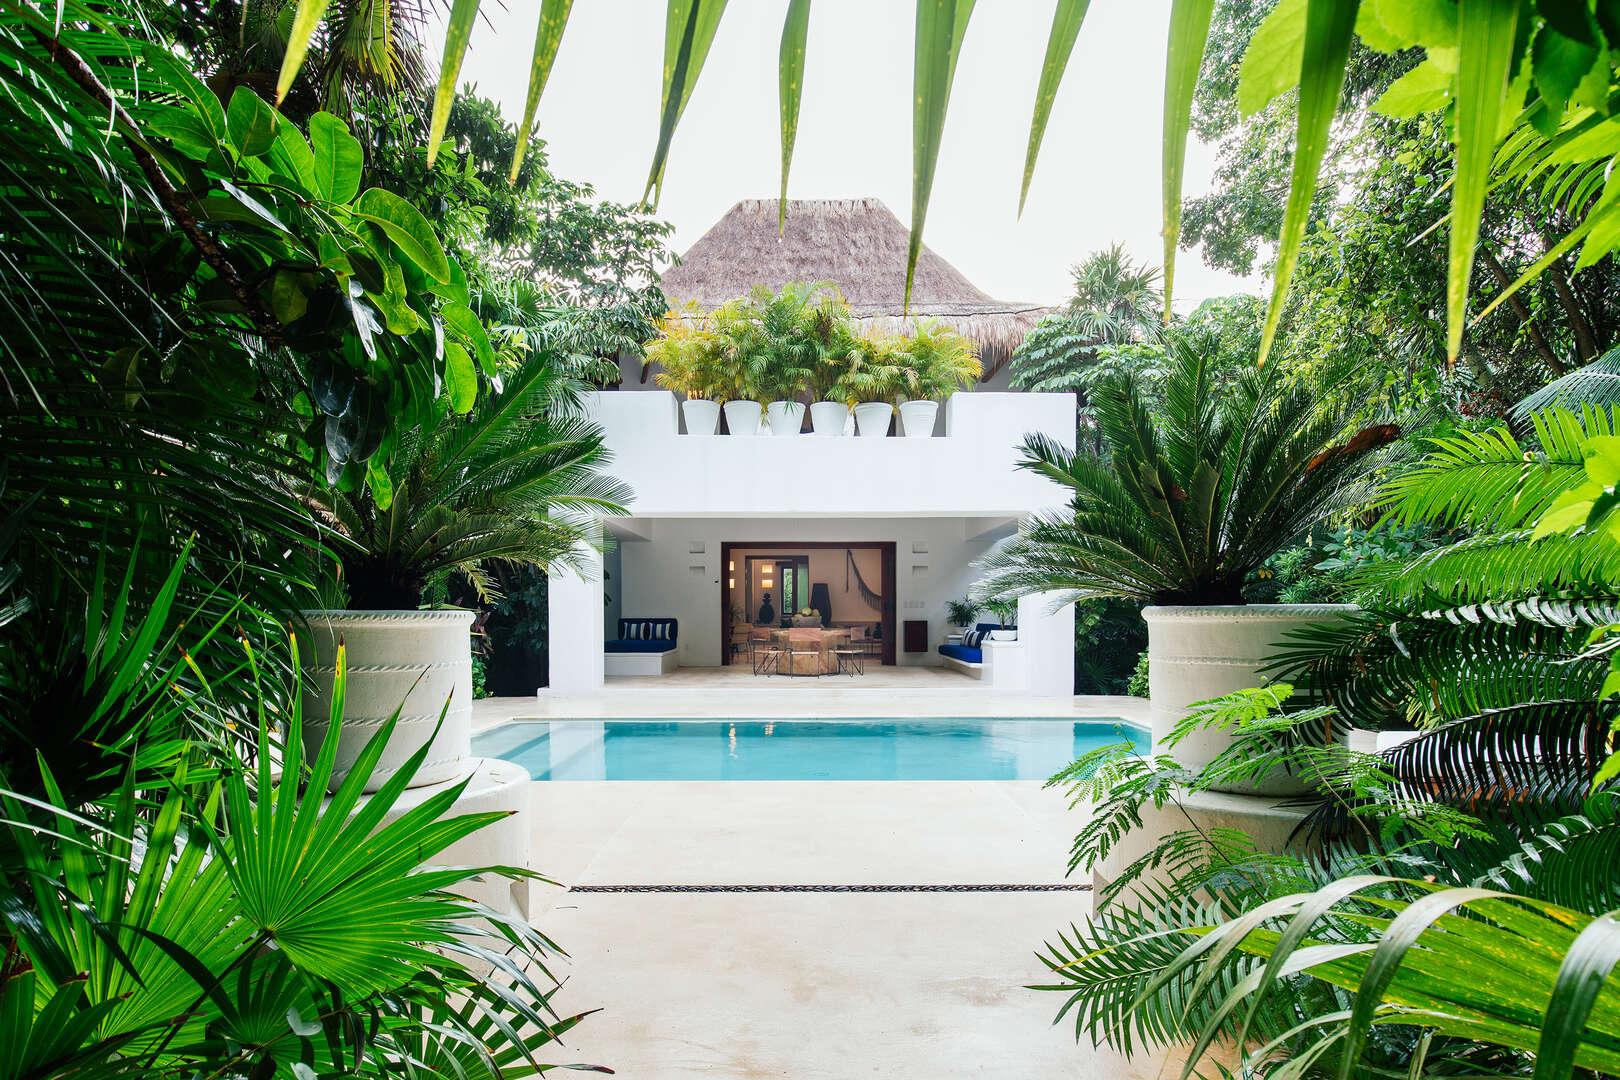 - Pool Villa - Image 1/13